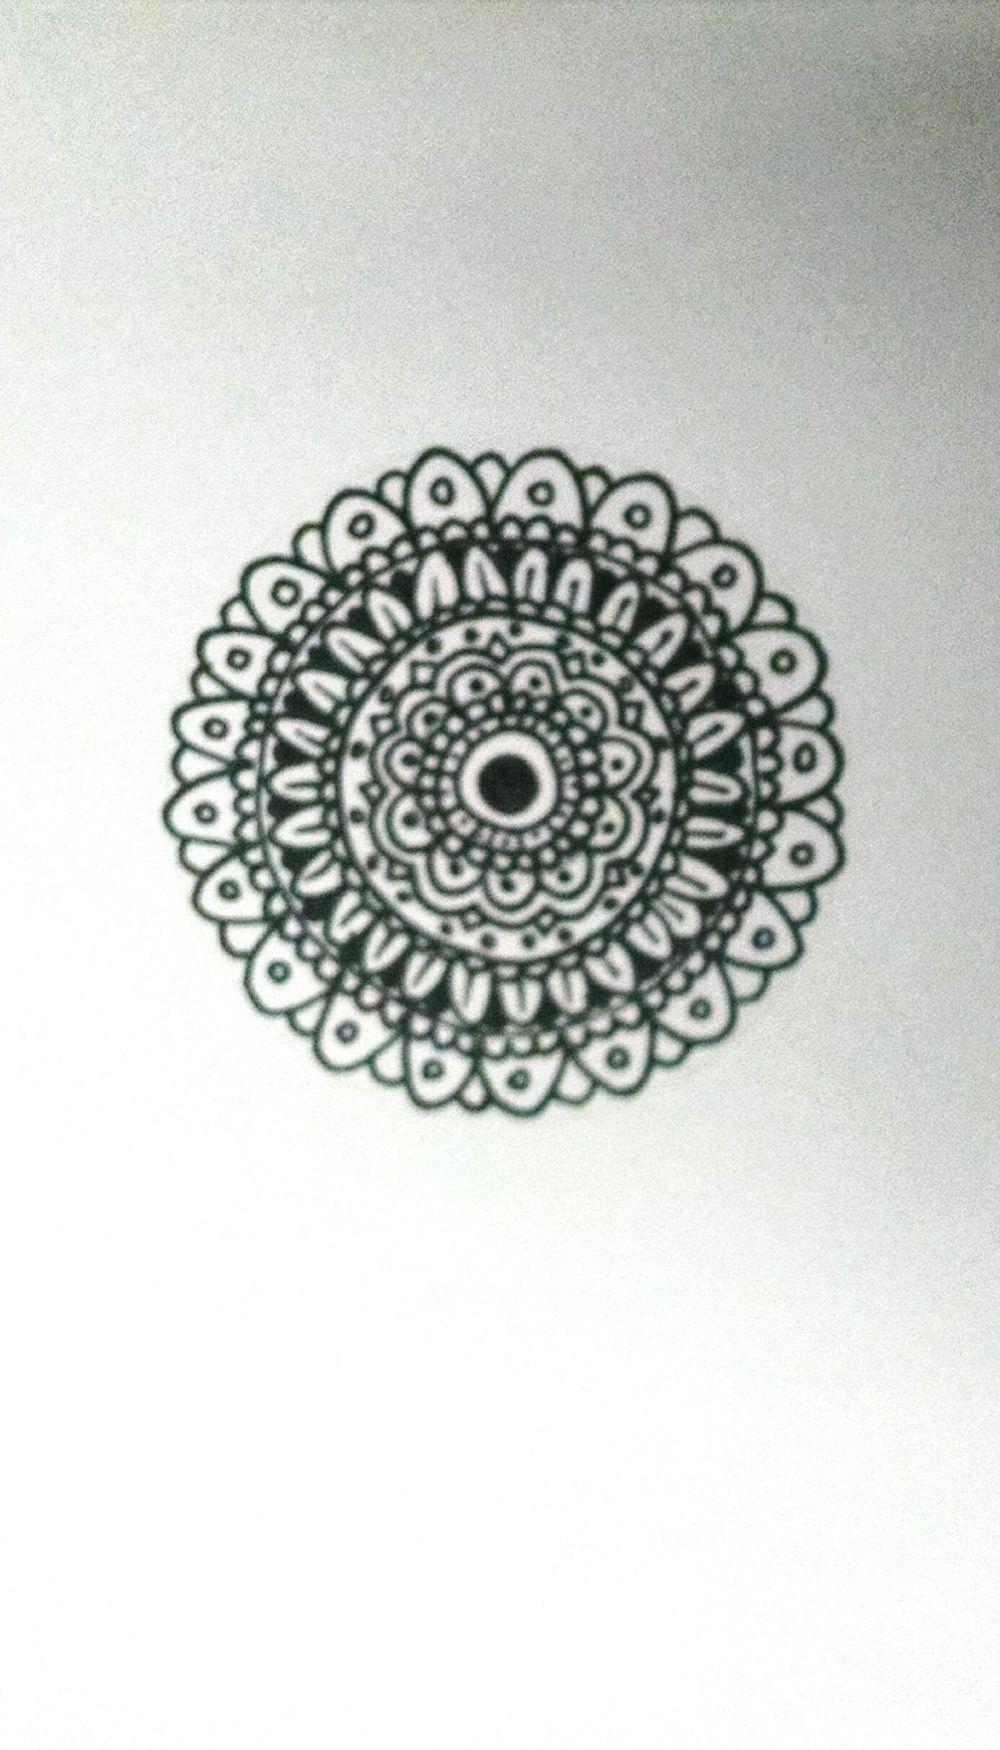 Checkout my mandalas - image 1 - student project